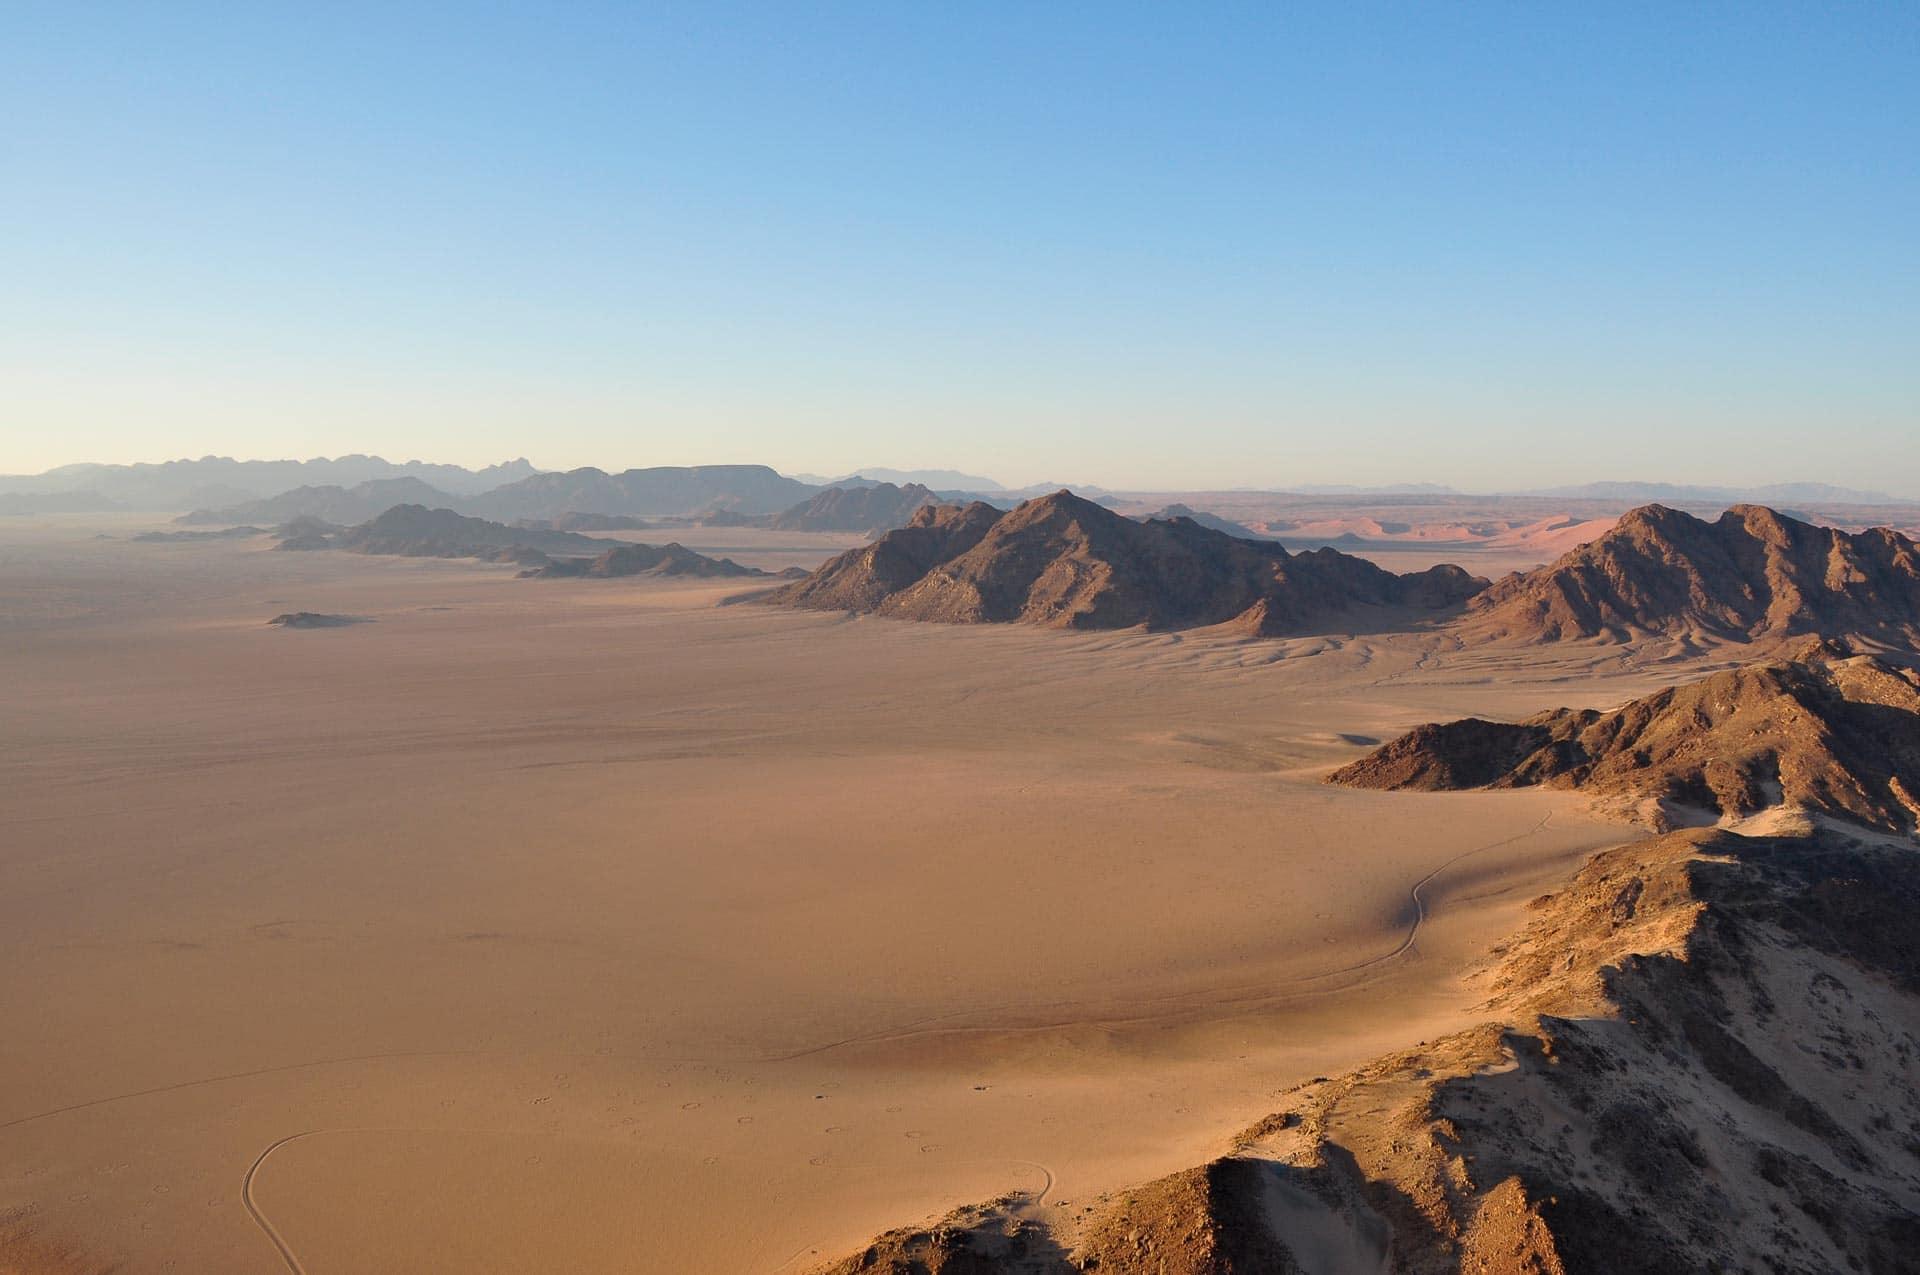 Namib-Ballonfahrt-Wueste-Namibia-Globetrotter-Select-11